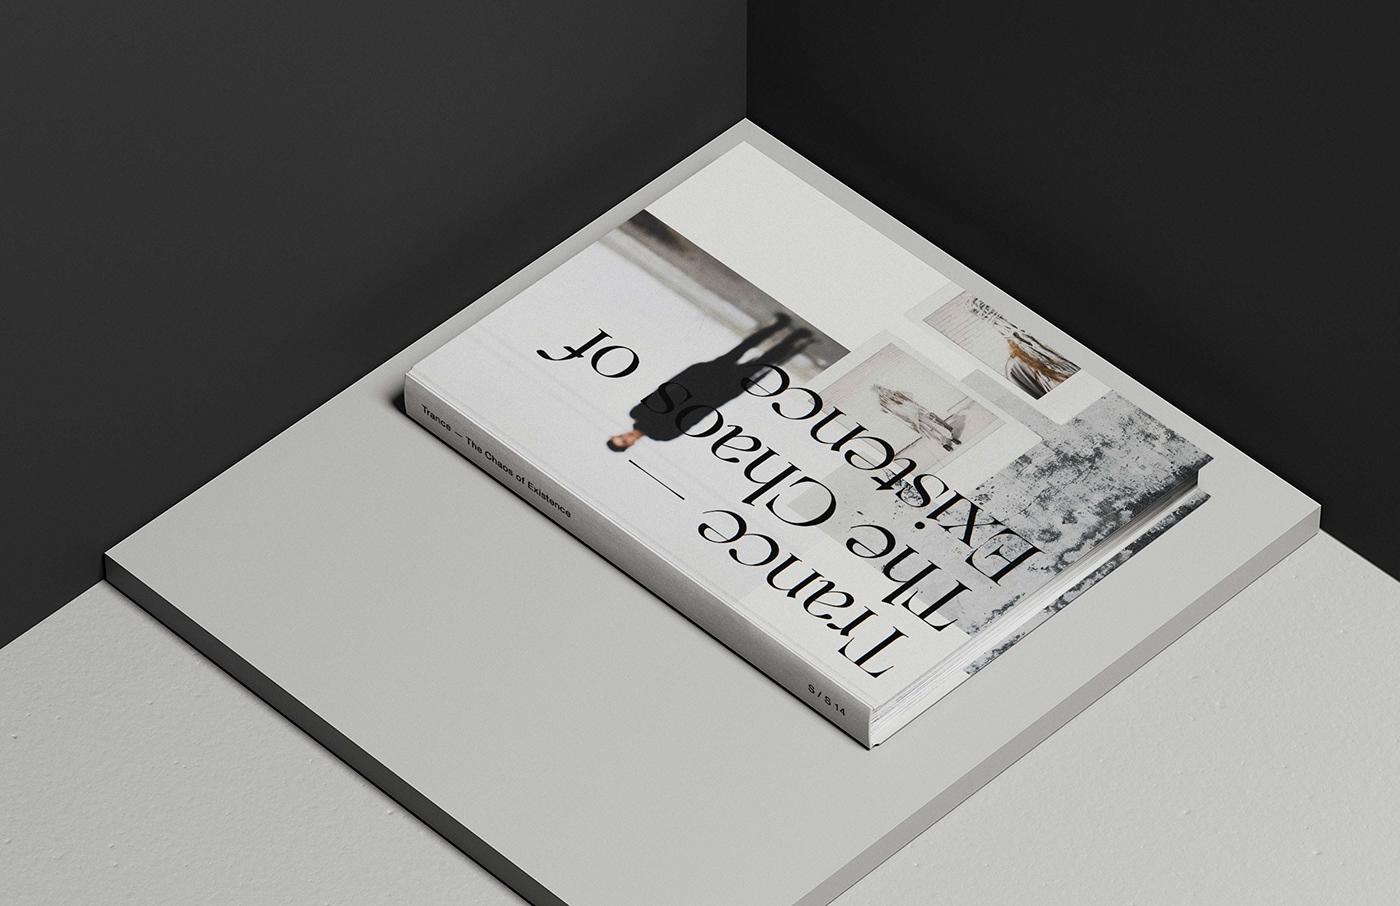 book cover book design editorial design  fashion collection fashion lookbook Lookbook Photography  POLAROID print design  typography